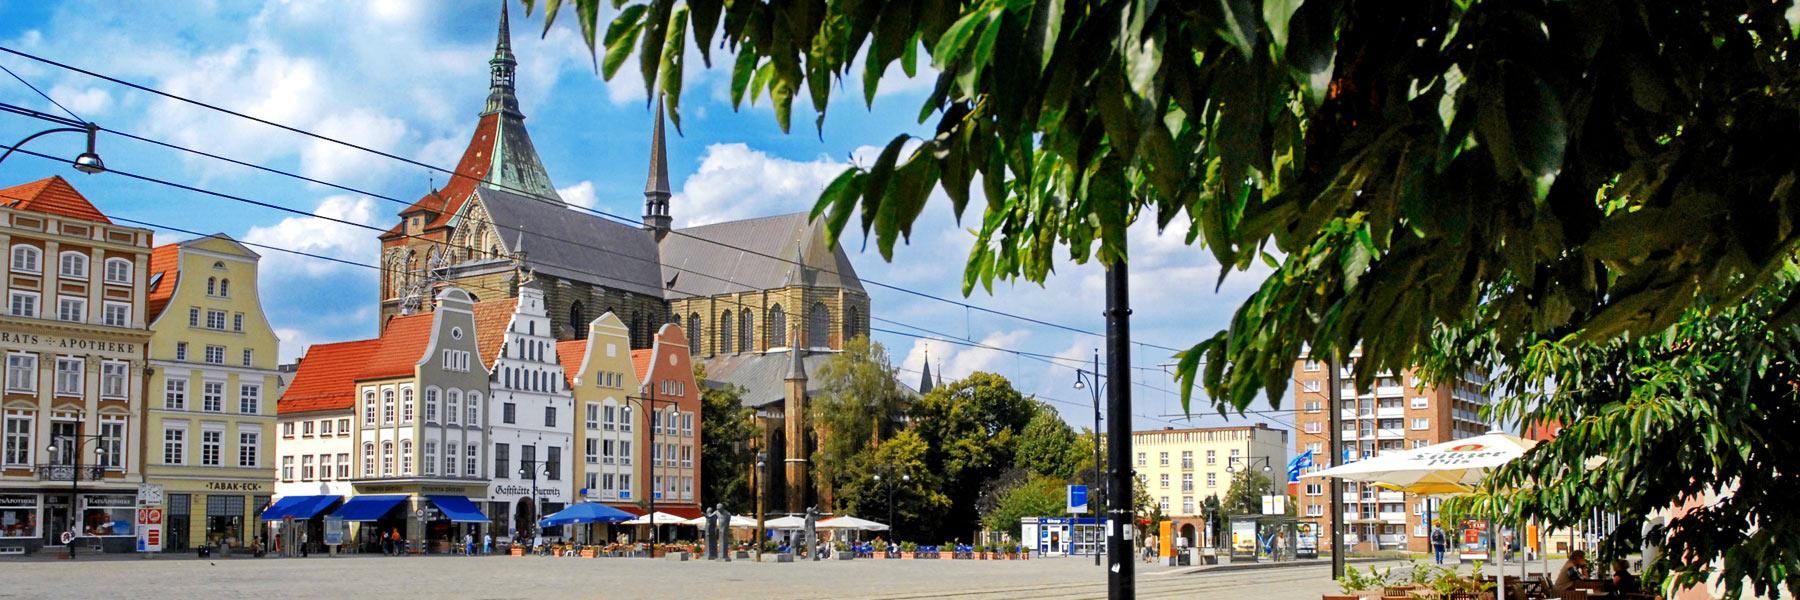 Neuer Markt - Hansestadt Rostock